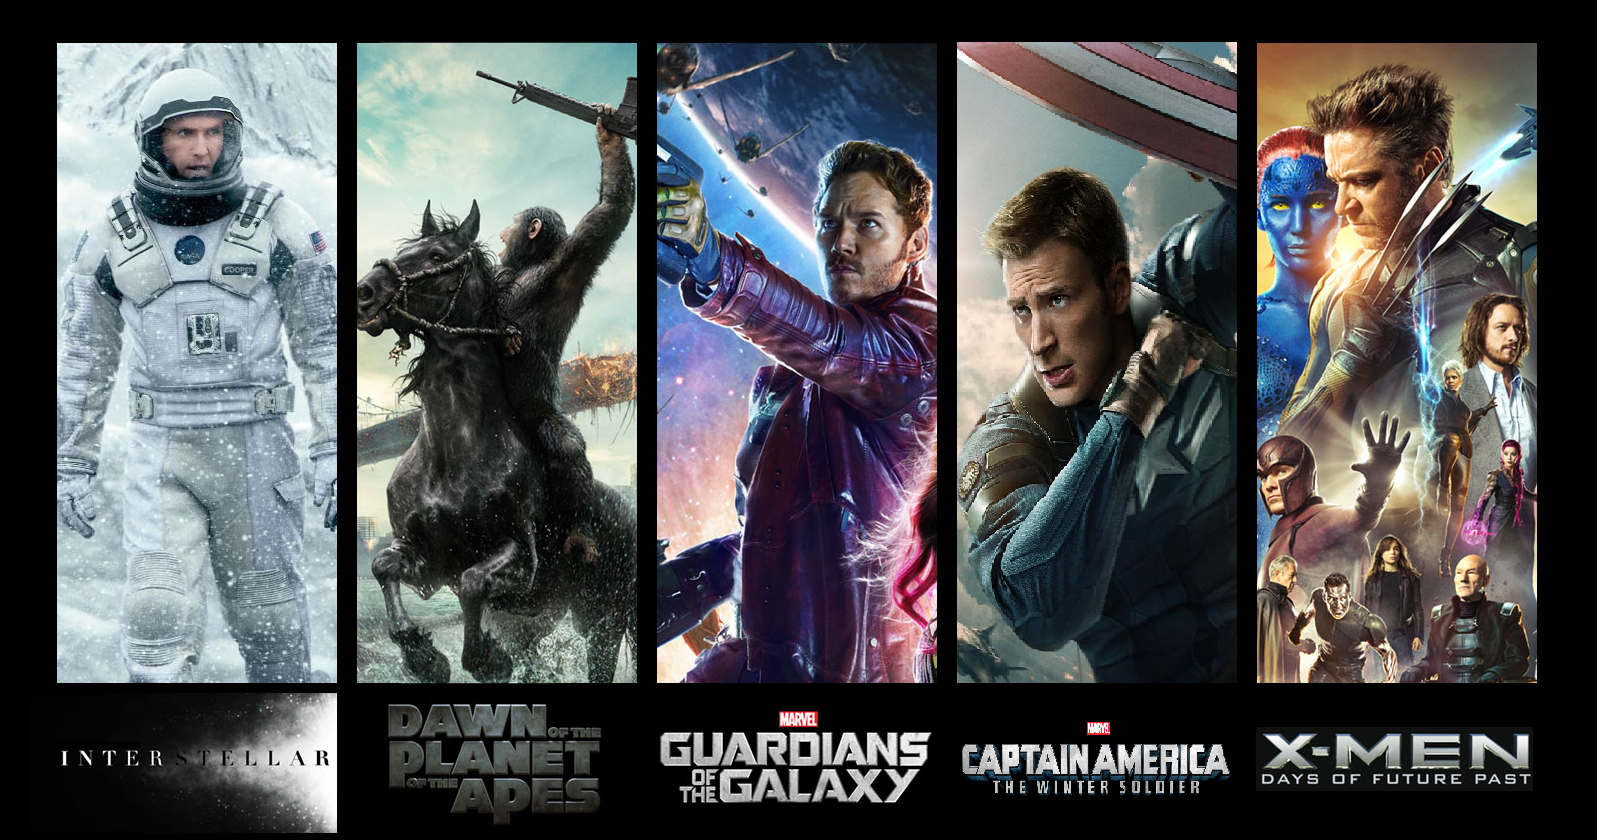 Oscars 2015 visual effects